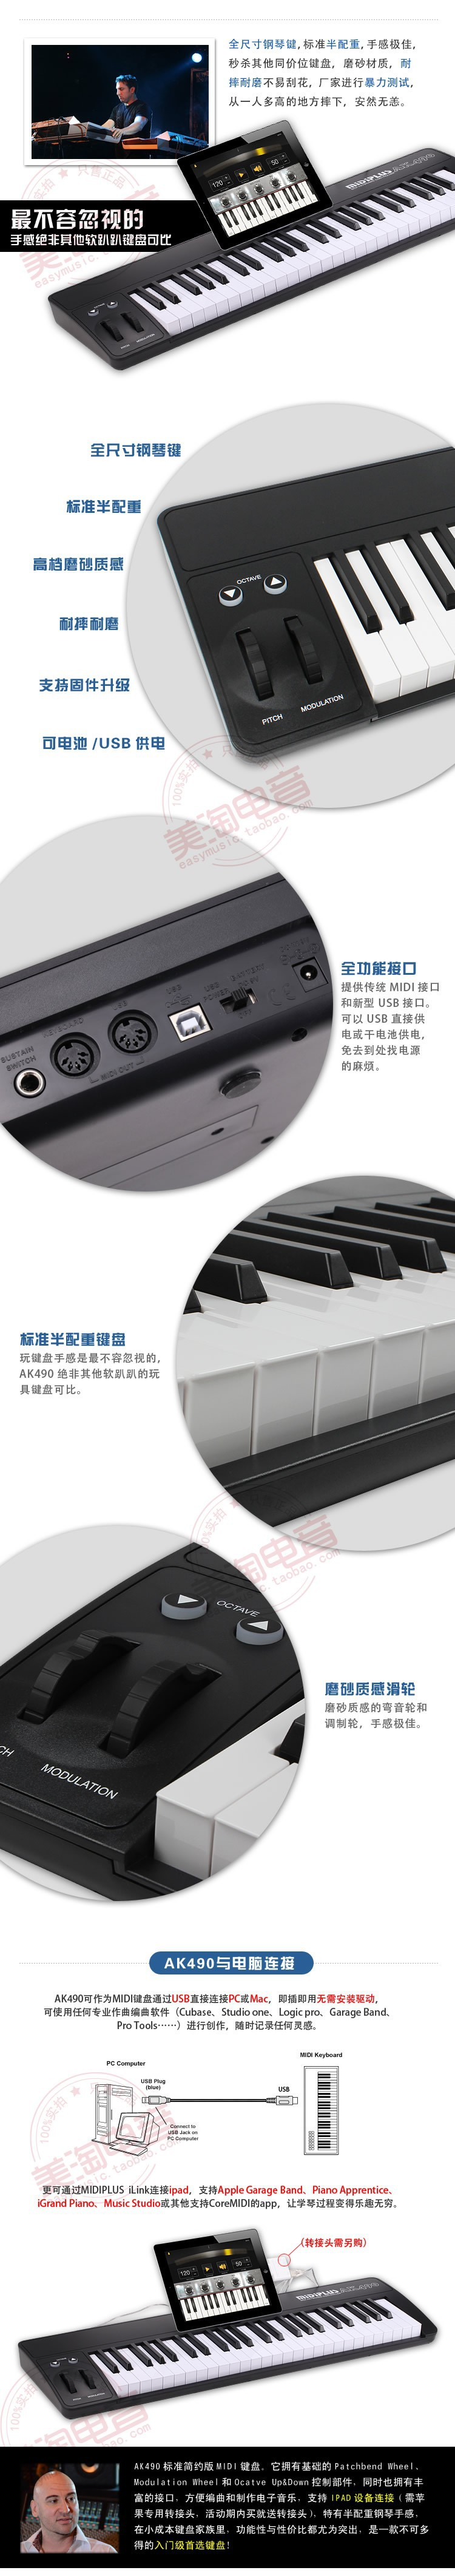 Midiplus AK490 brief 49 Key USB IPAD Midi Keyboard For /PC